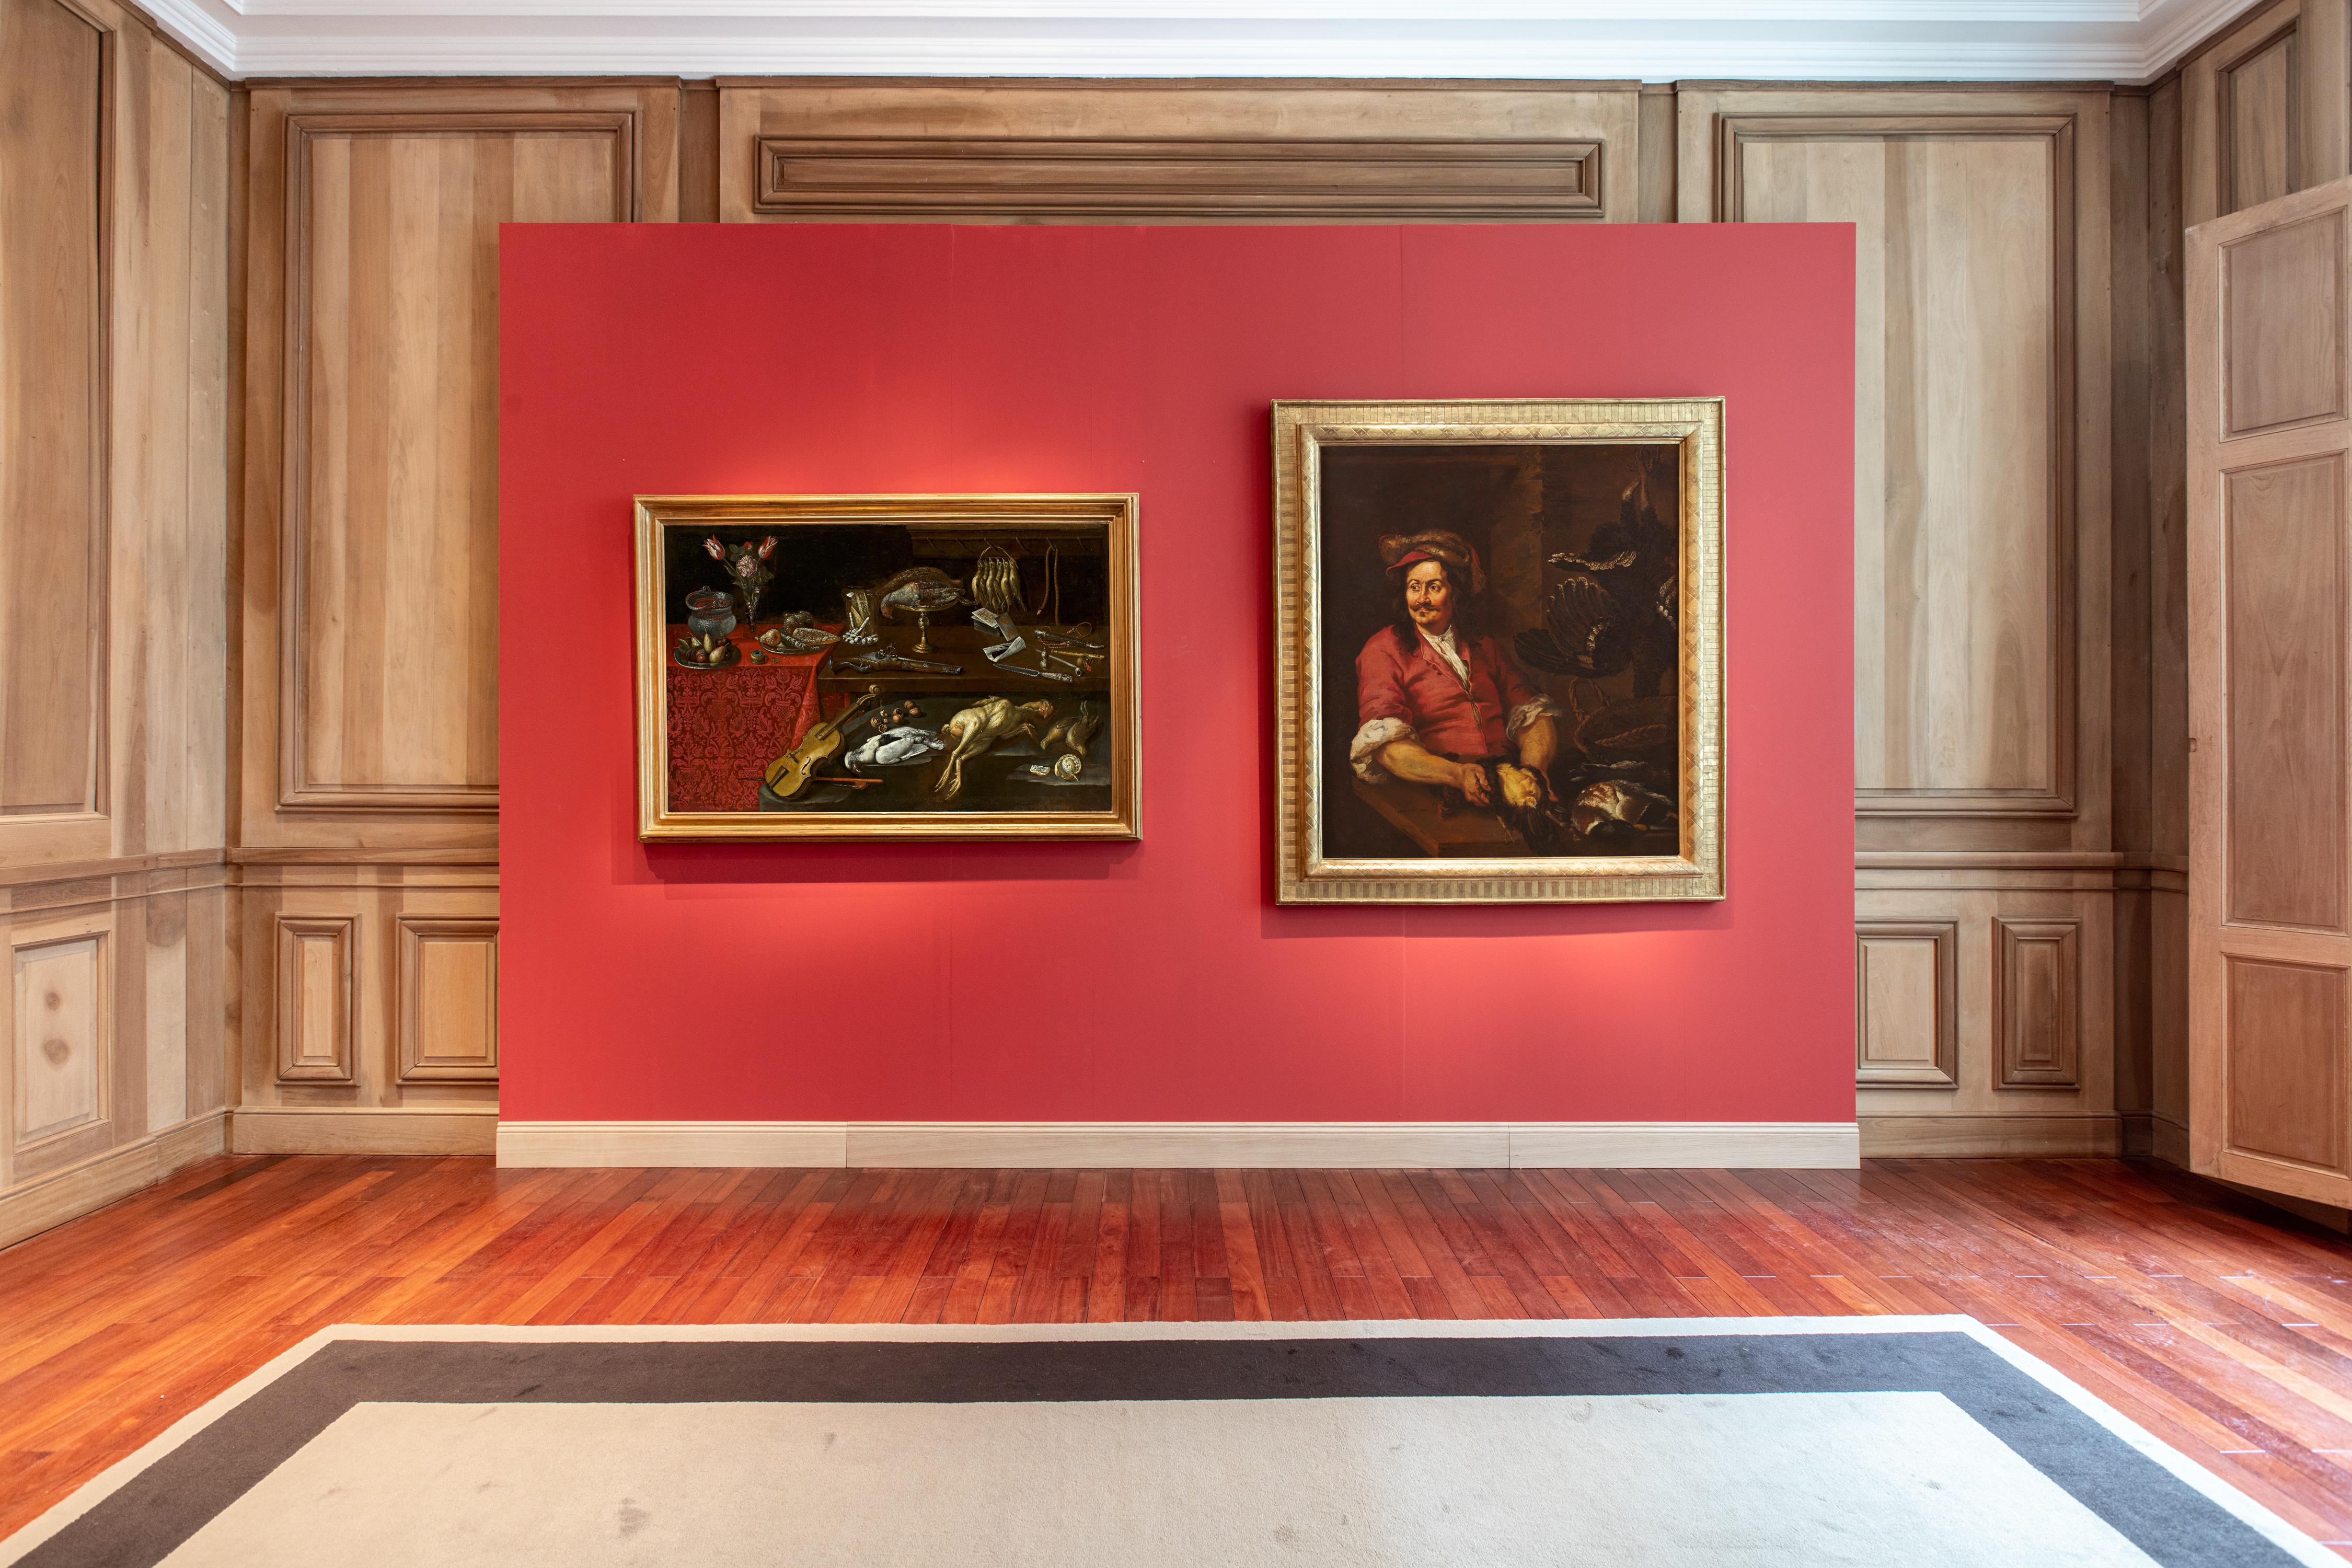 Galerie-Canesso-BD@photo-Tanguy-de-Montesson-01-2.jpg